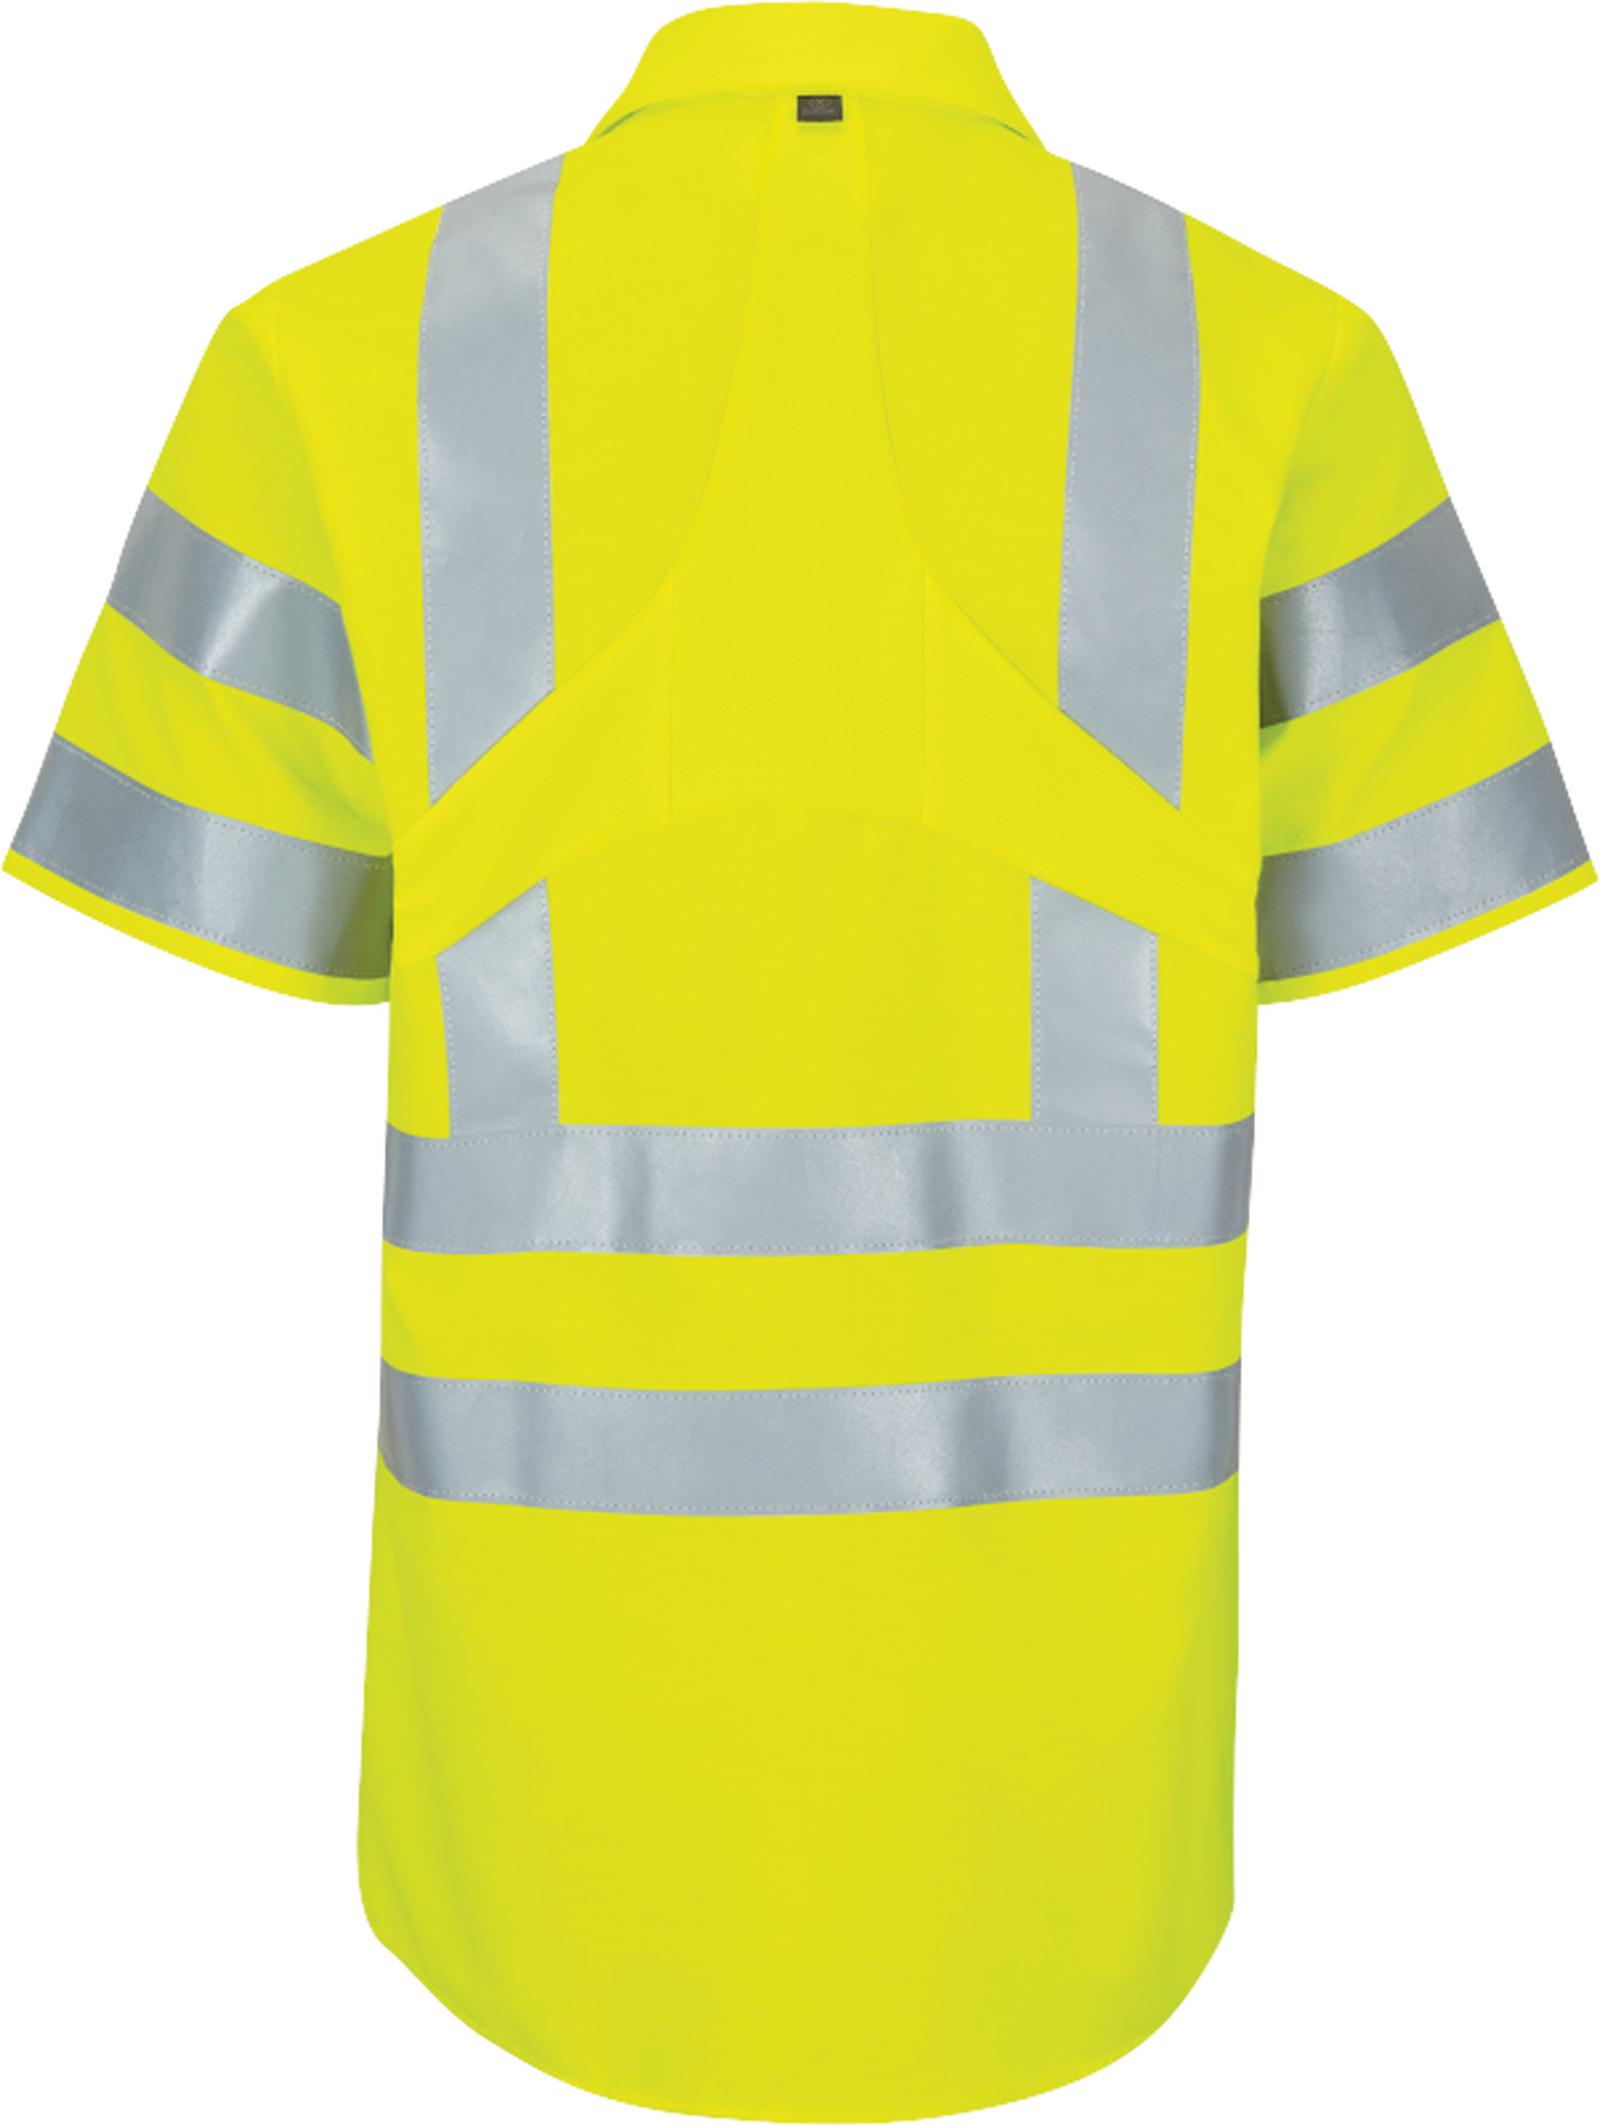 Short Sleeve Hi-Visibility Ripstop Work Shirt with MIMIX™ + OilBlok, Type R Class 3